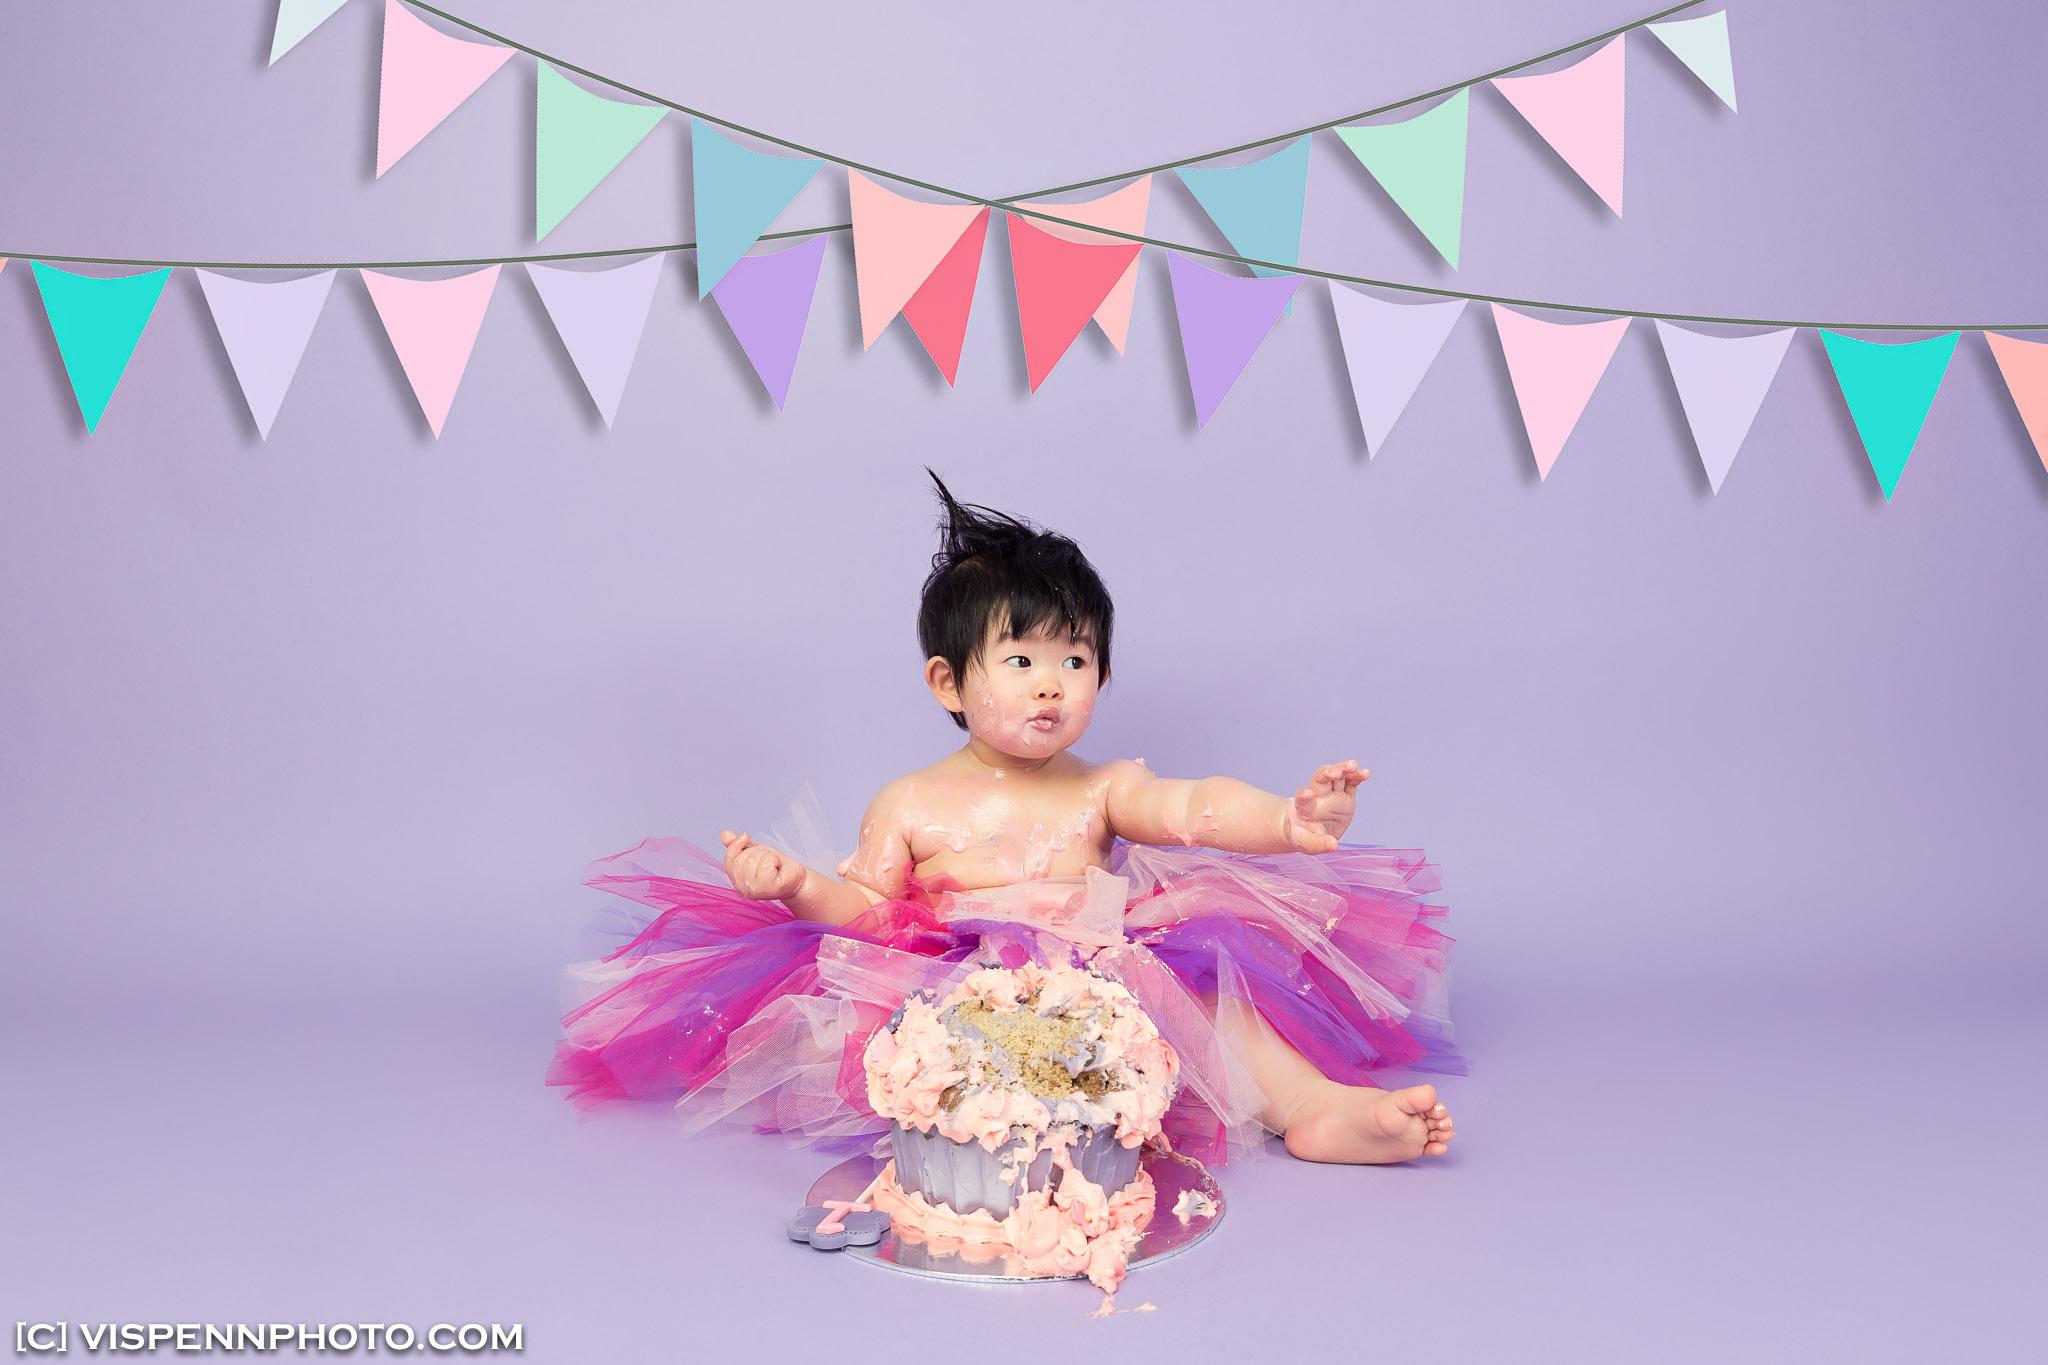 Melbourne Newborn Baby Family Photo BaoBao VISPENN 墨尔本 儿童 宝宝 百天照 满月照 孕妇照 全家福 KIDS 5D1 8234